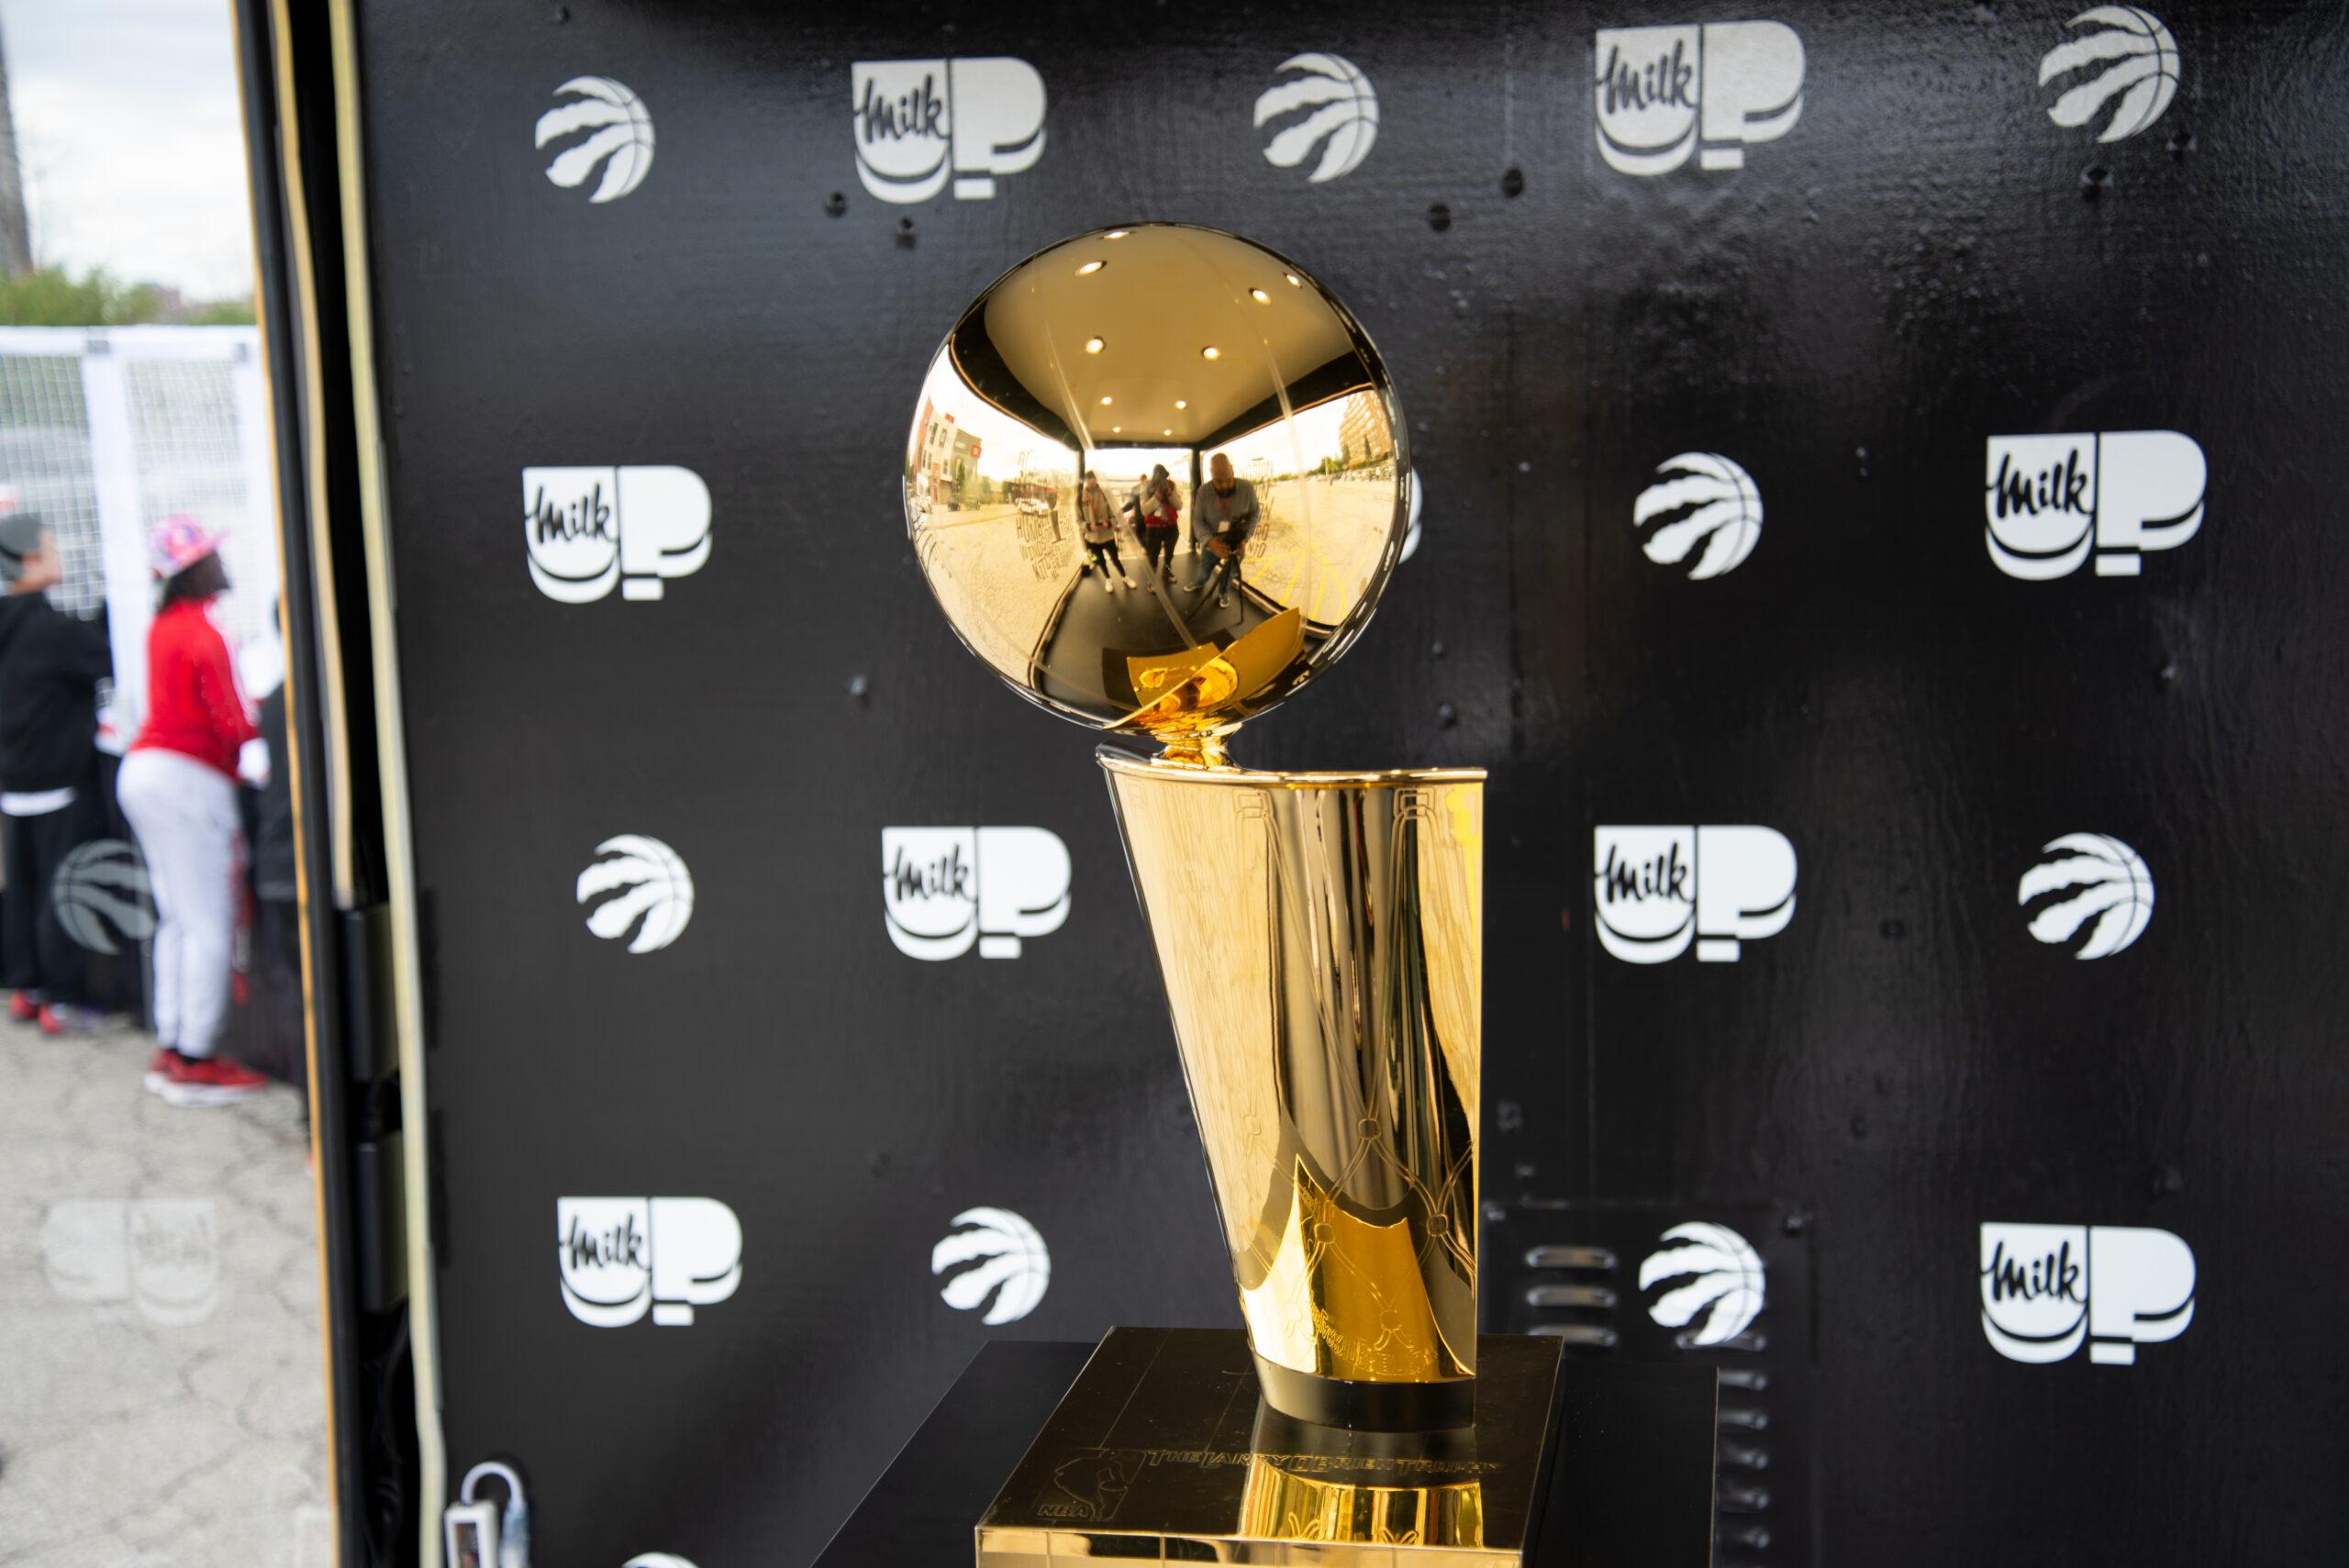 Larry O'B trophy tour brings Raptors pride to Humber